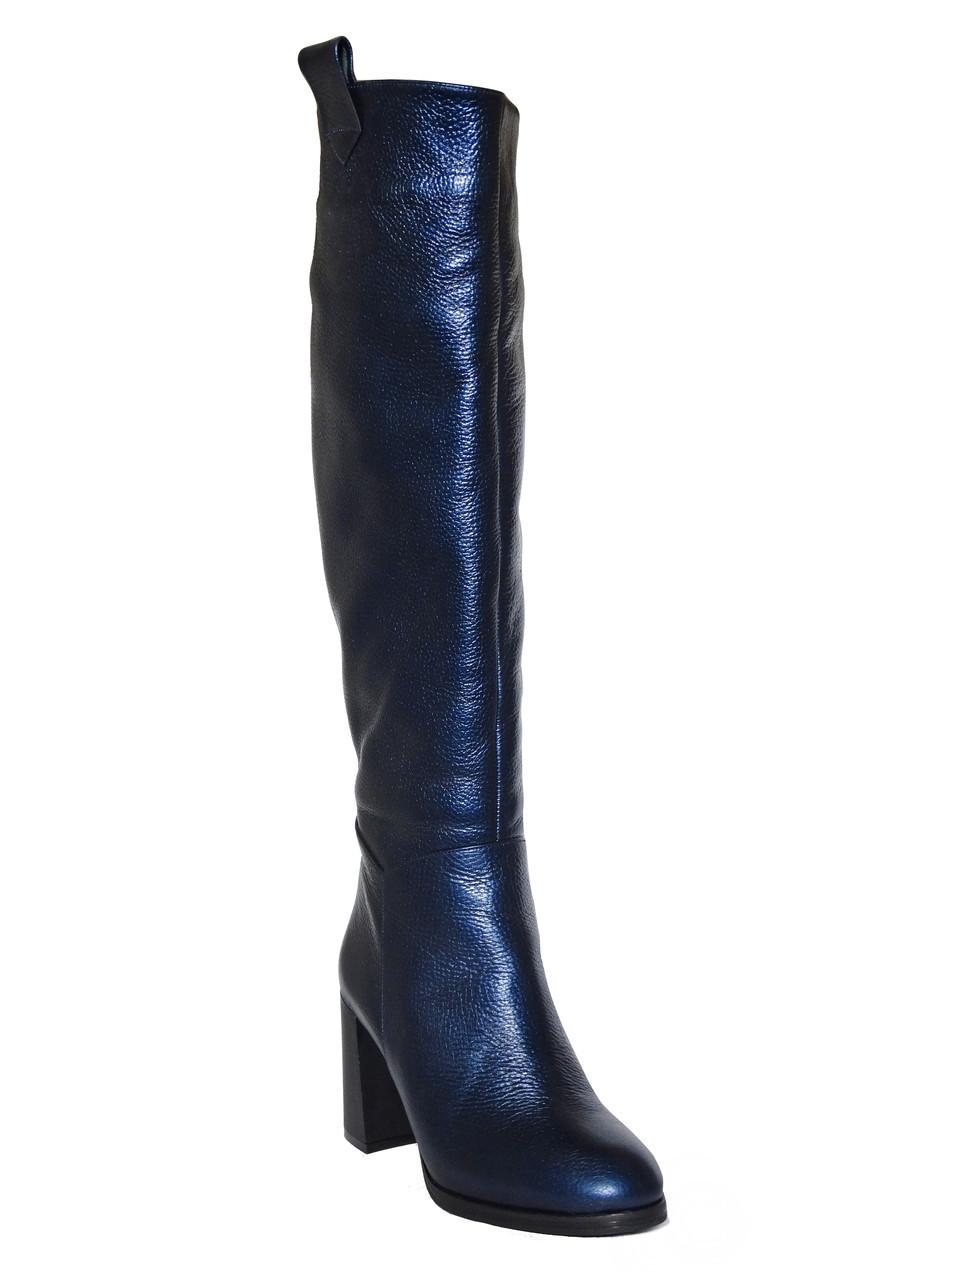 9d491028efba Женские кожаные зимние сапоги на каблук (синие) Paoletti №1332: продажа,  цена в Одессе. ...